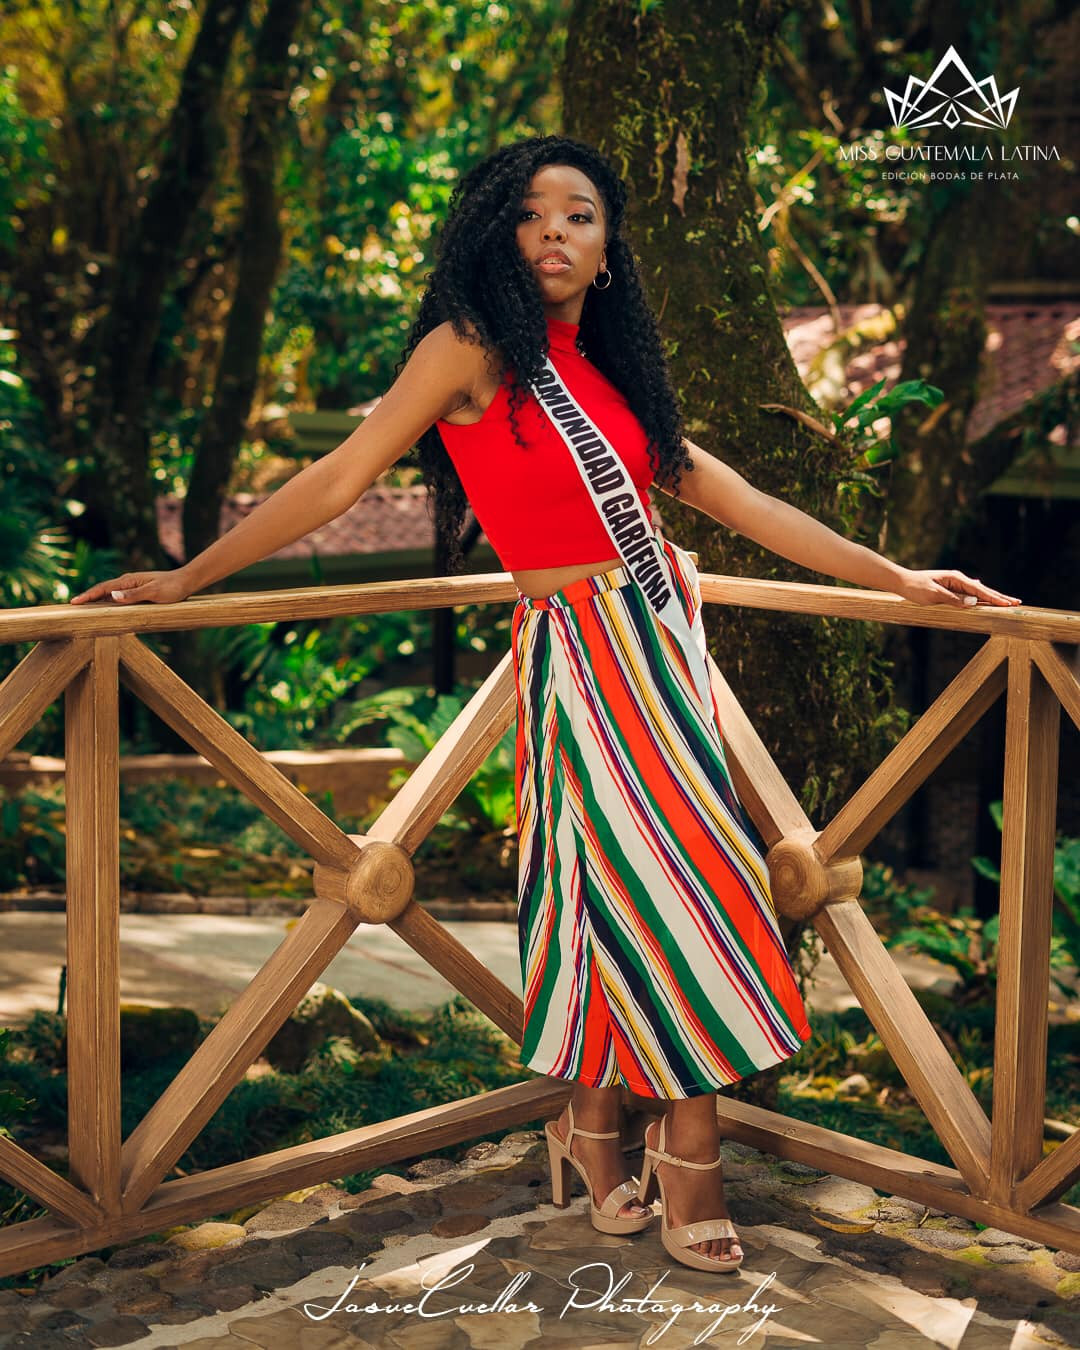 candidatas a miss guatemala latina 2021. final: 30 de abril. - Página 7 BFj6f2